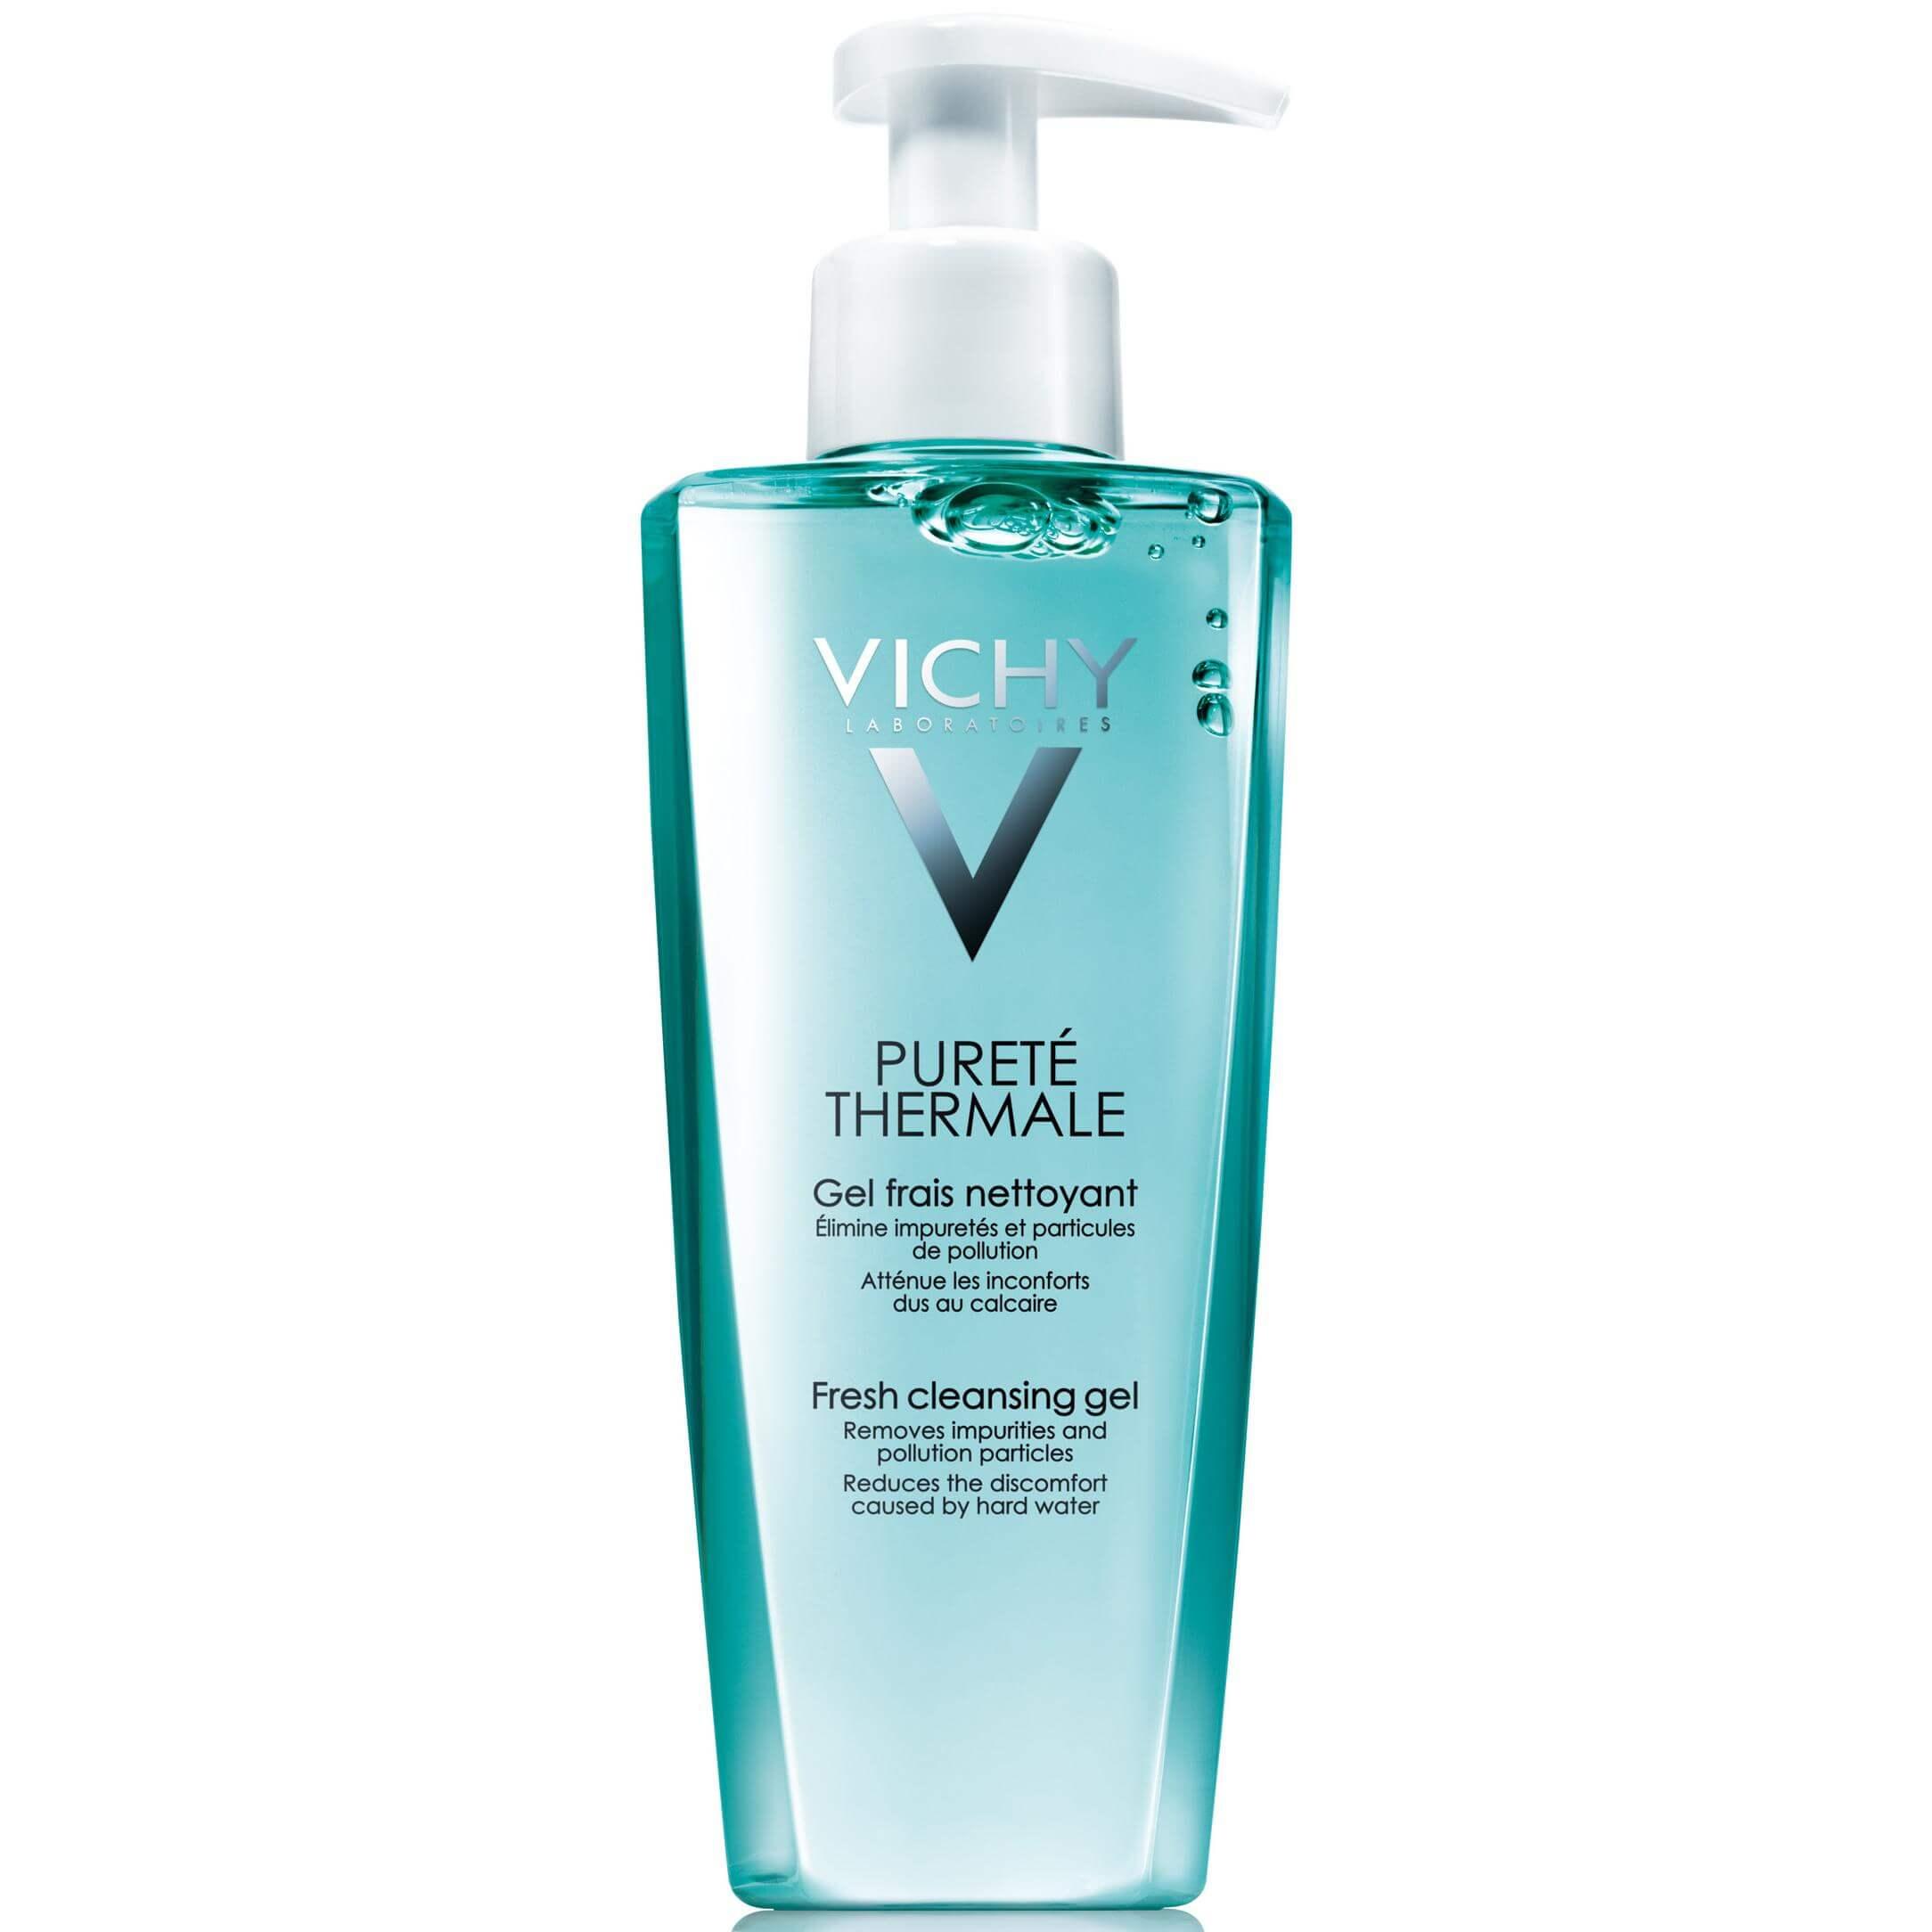 Vichy Purete Thermale Gel Nettoyant Δροσερό Gel Καθαρισμού Προσώπου 200ml